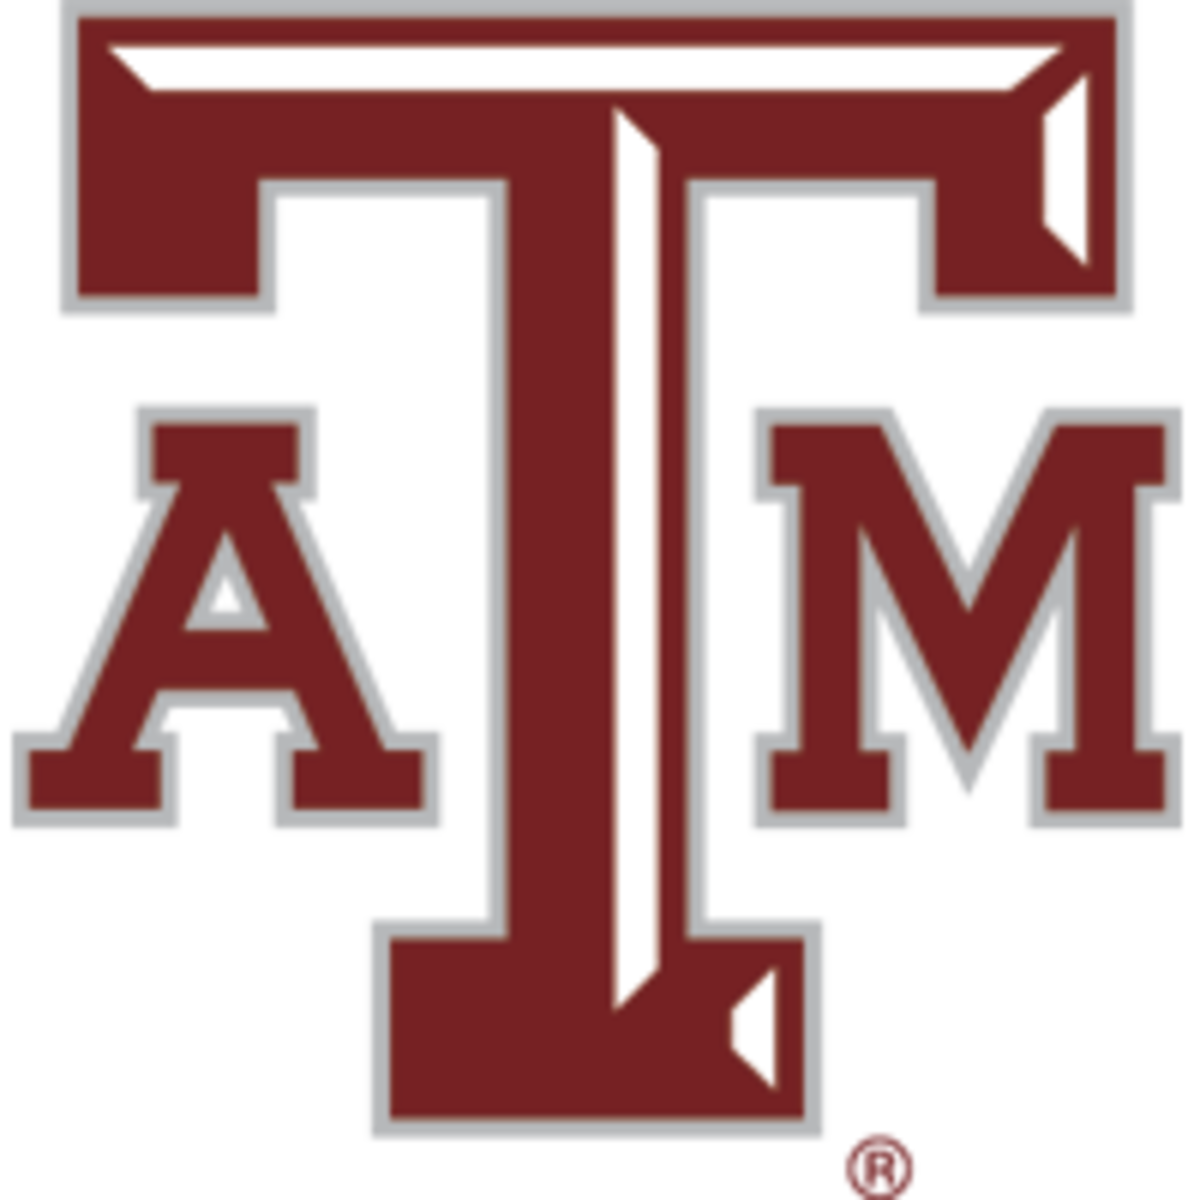 College Football Top 25 Rankings: Texas A&M